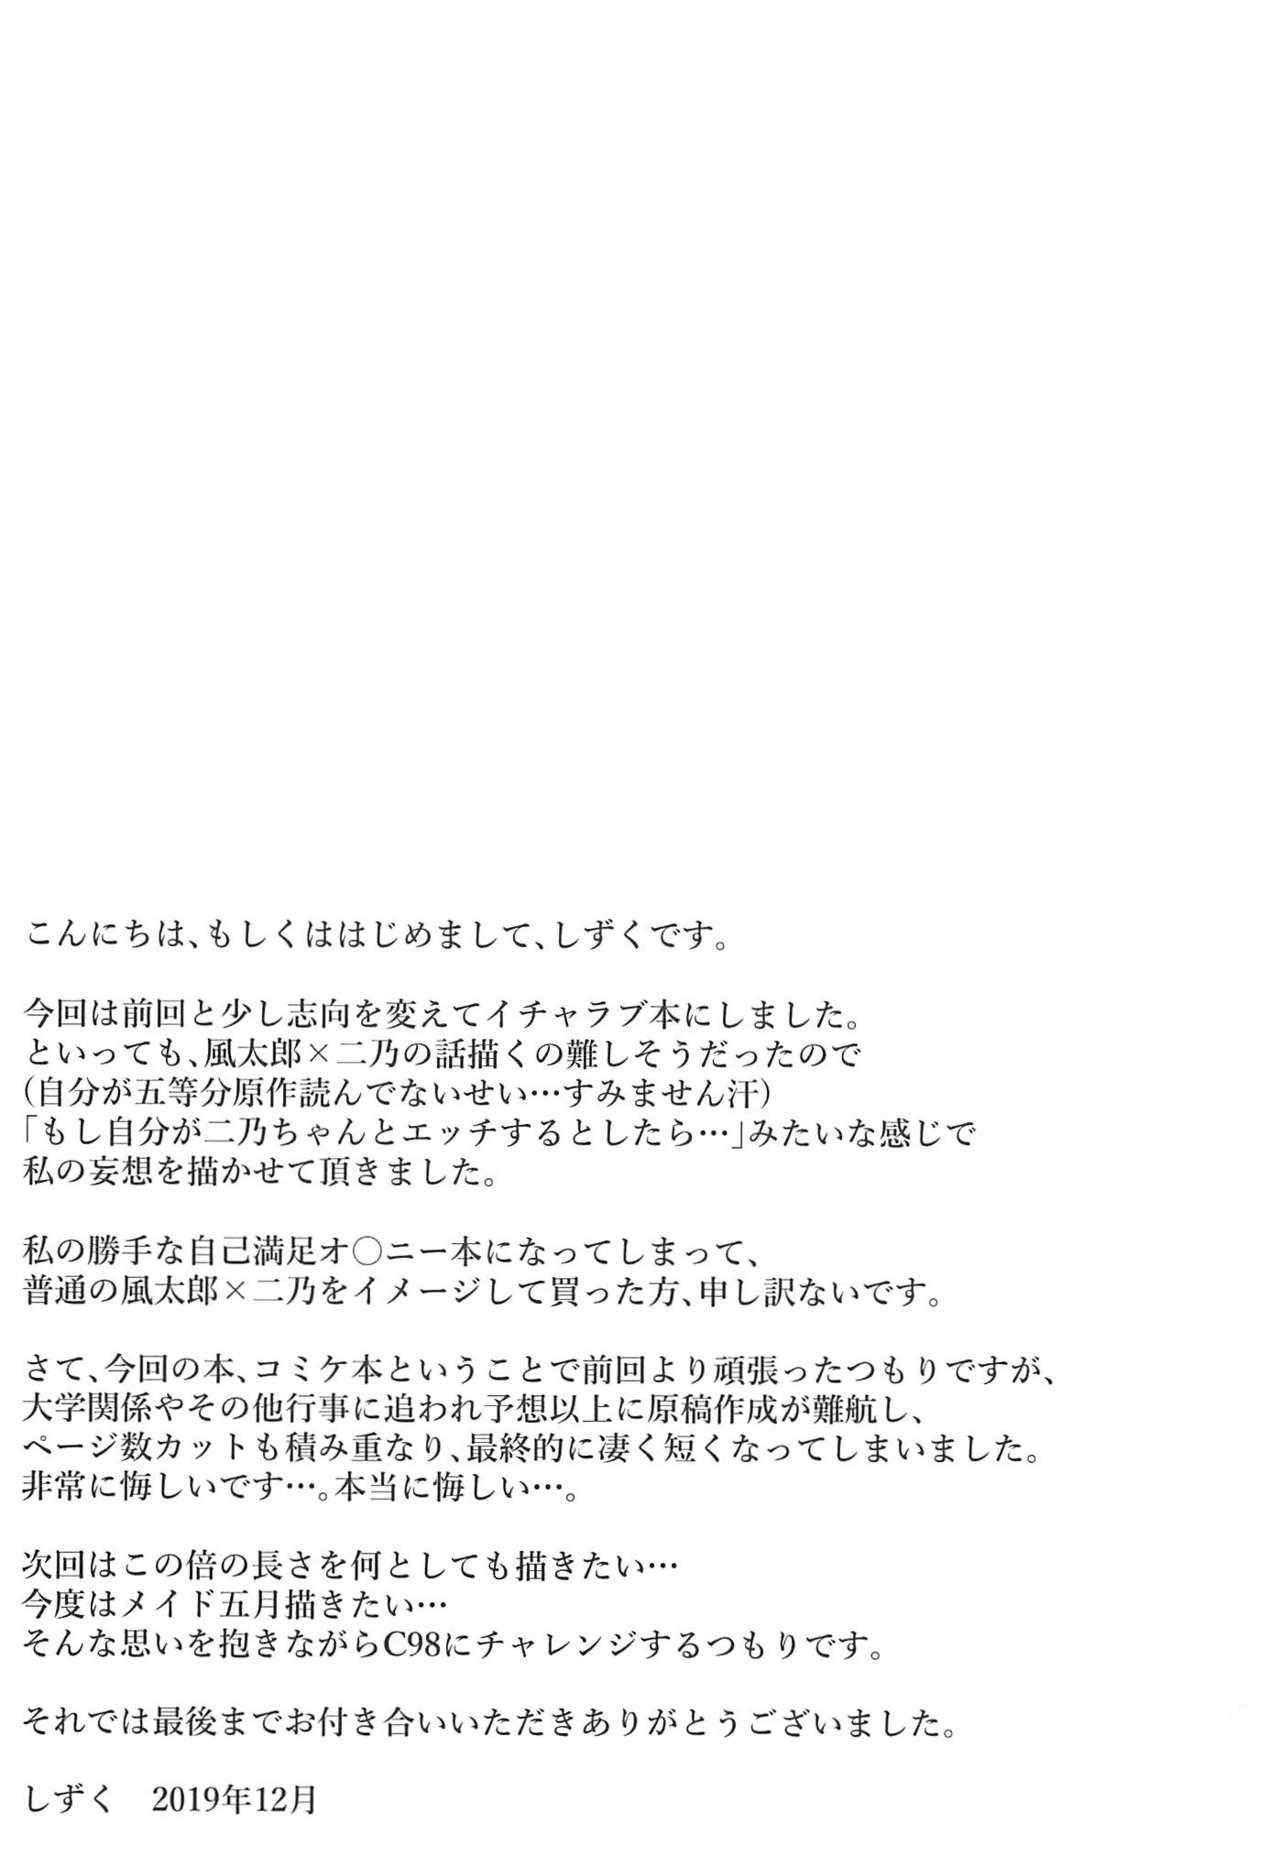 Gohoushi Maid Nino-chan 12